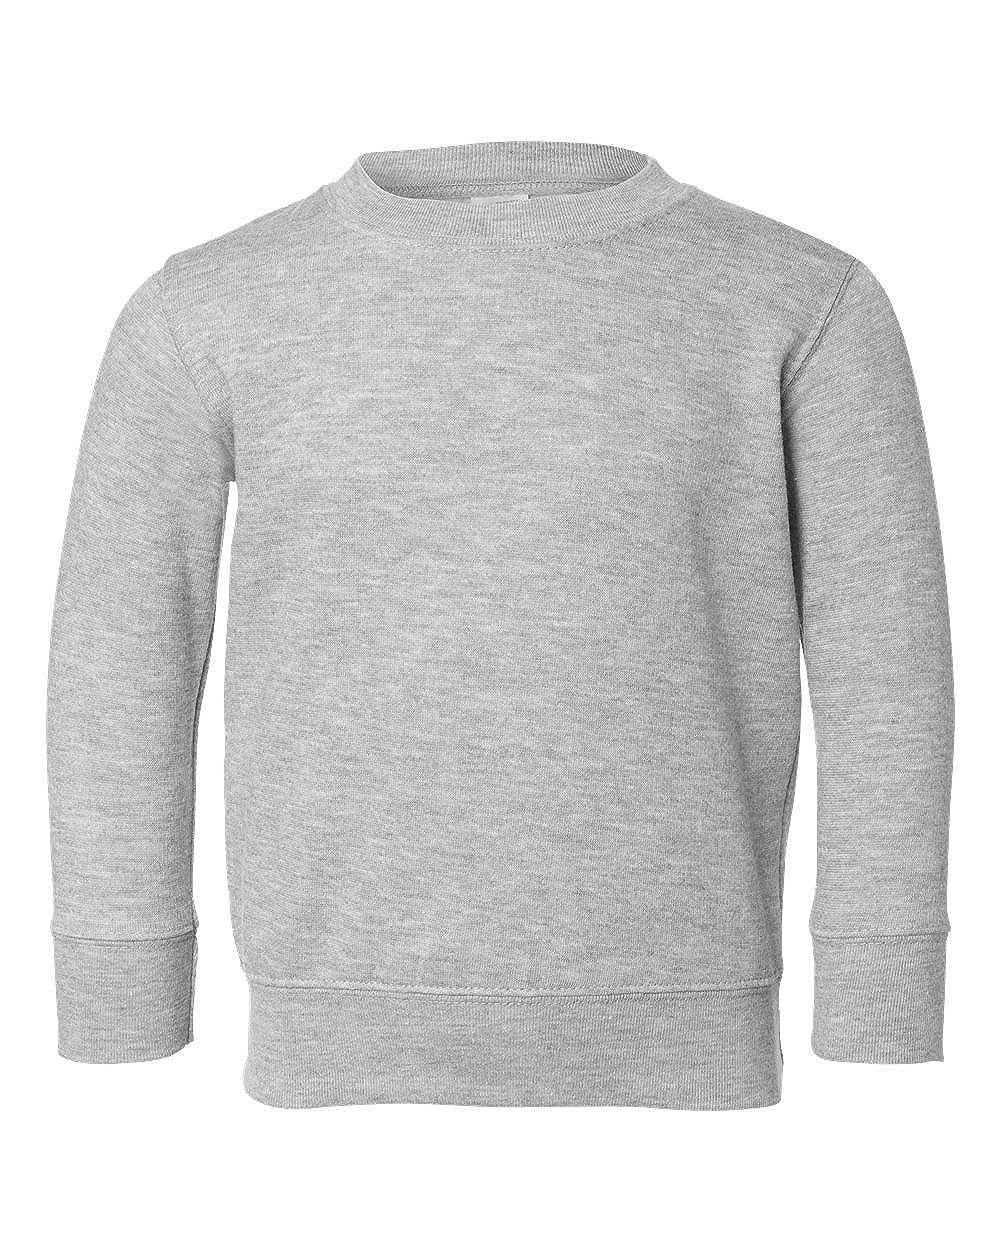 Rabbit Skins Toddler 7.5 oz. Fleece Sweatshirt 3317